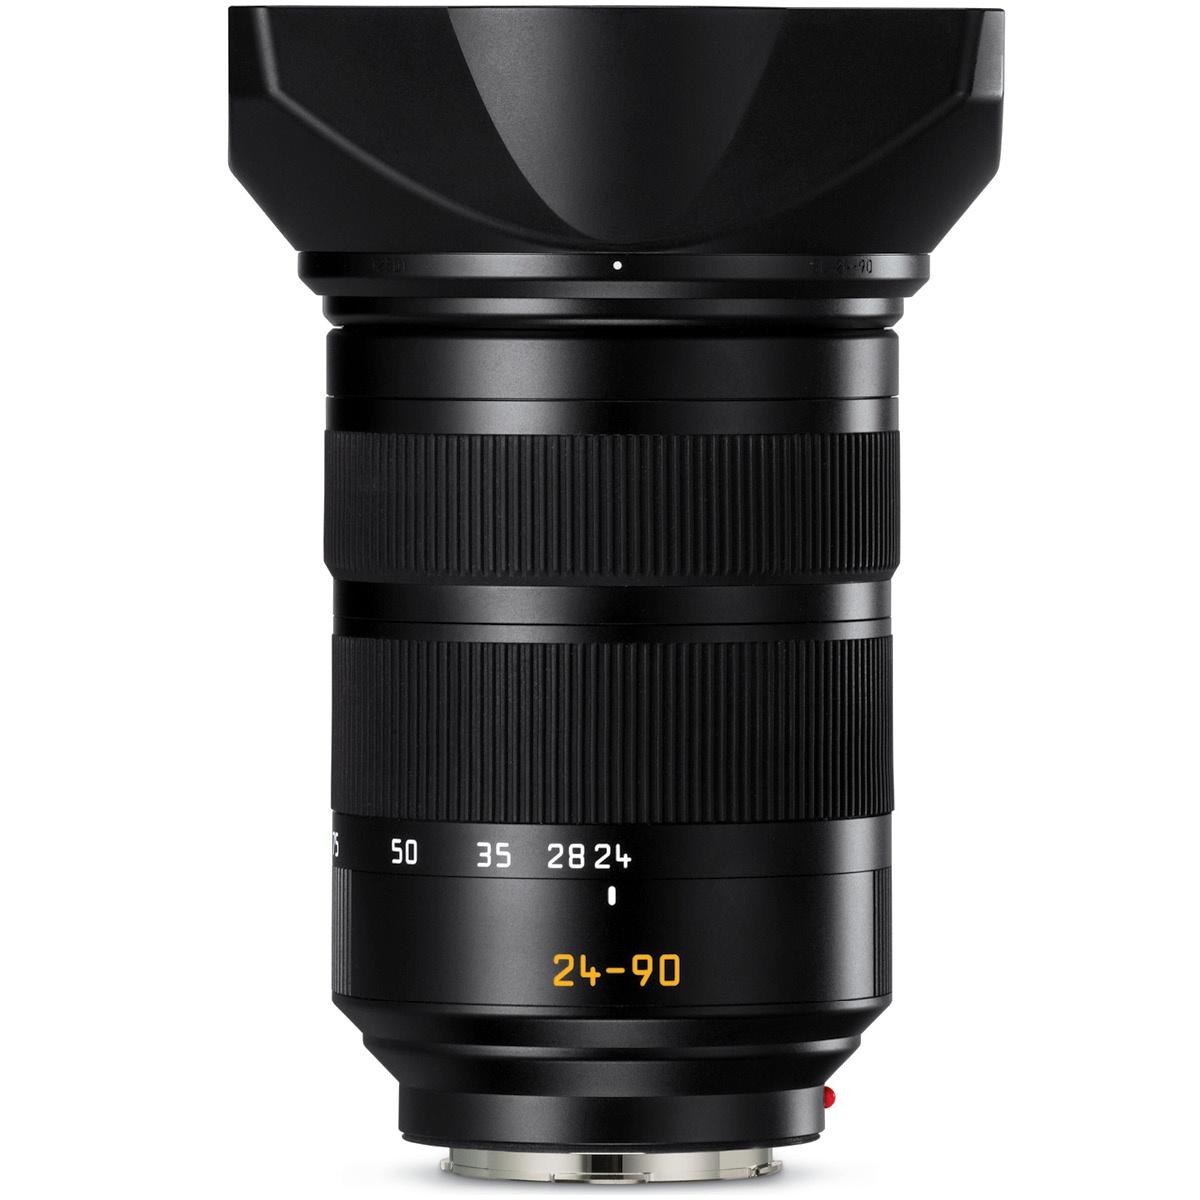 Leica 24-90 mm 1:2,8-4,0 Vario-Elmarit-SL ASPH